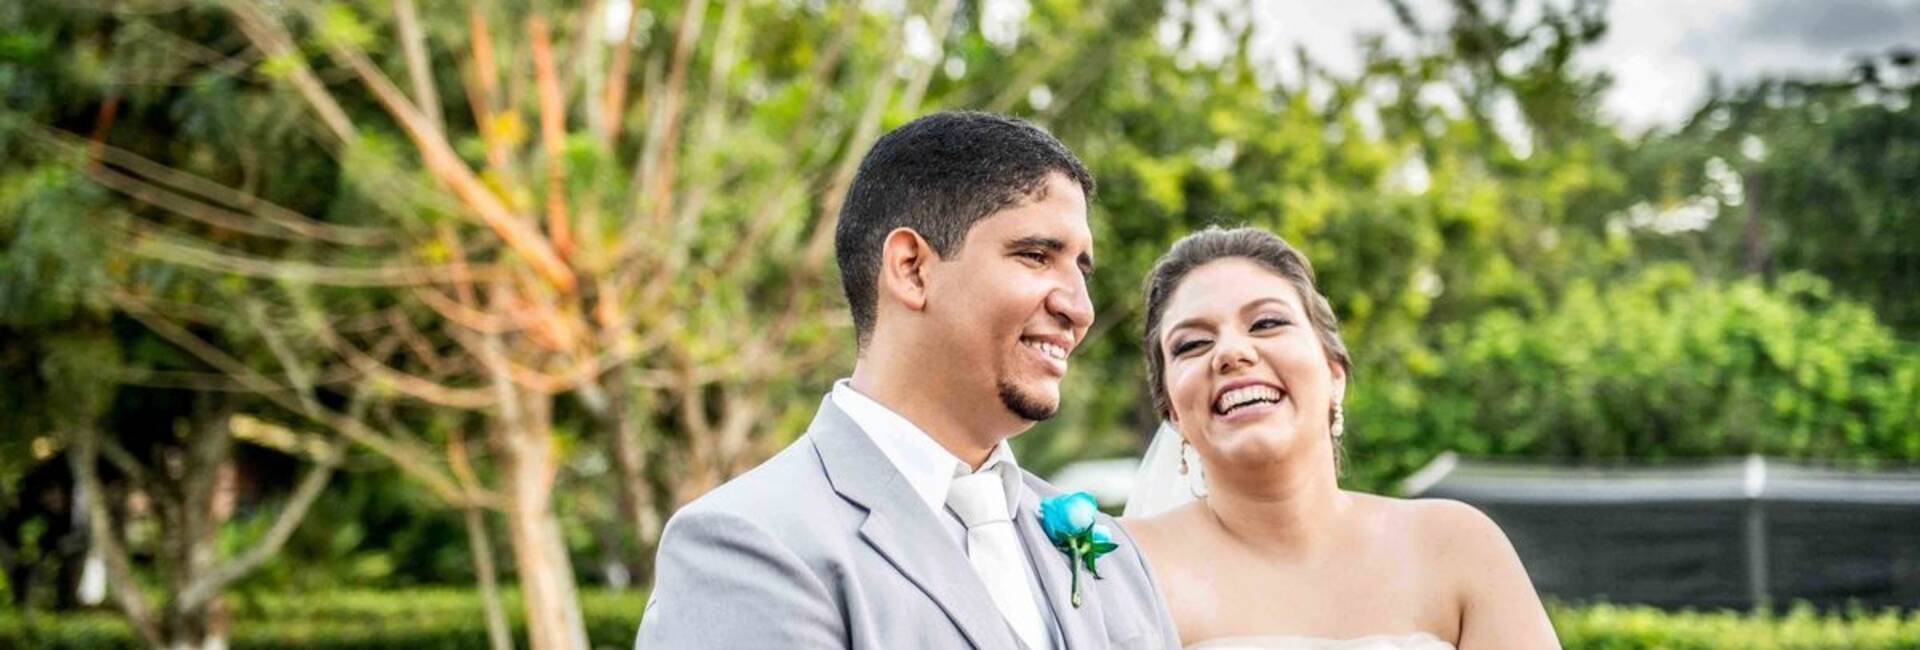 Casamento de Vanessa & Dalbert